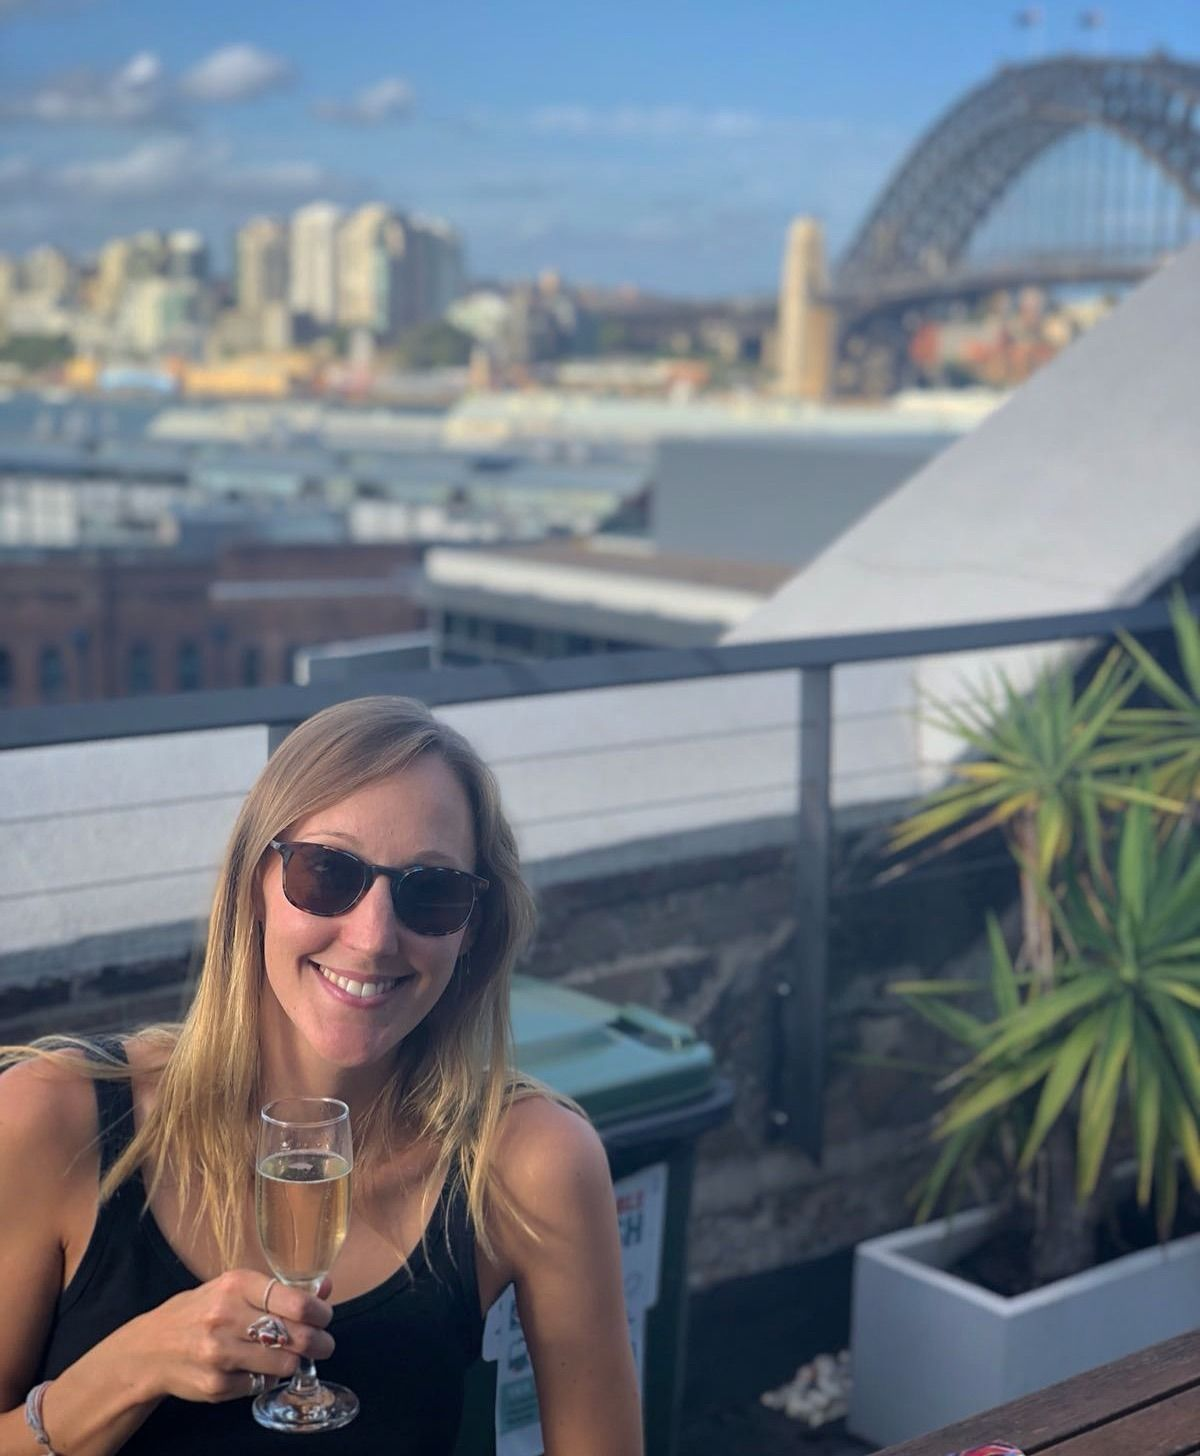 Hayley-Lewis-A-Lovely-Planet-Sydney- (1) 2.jpg